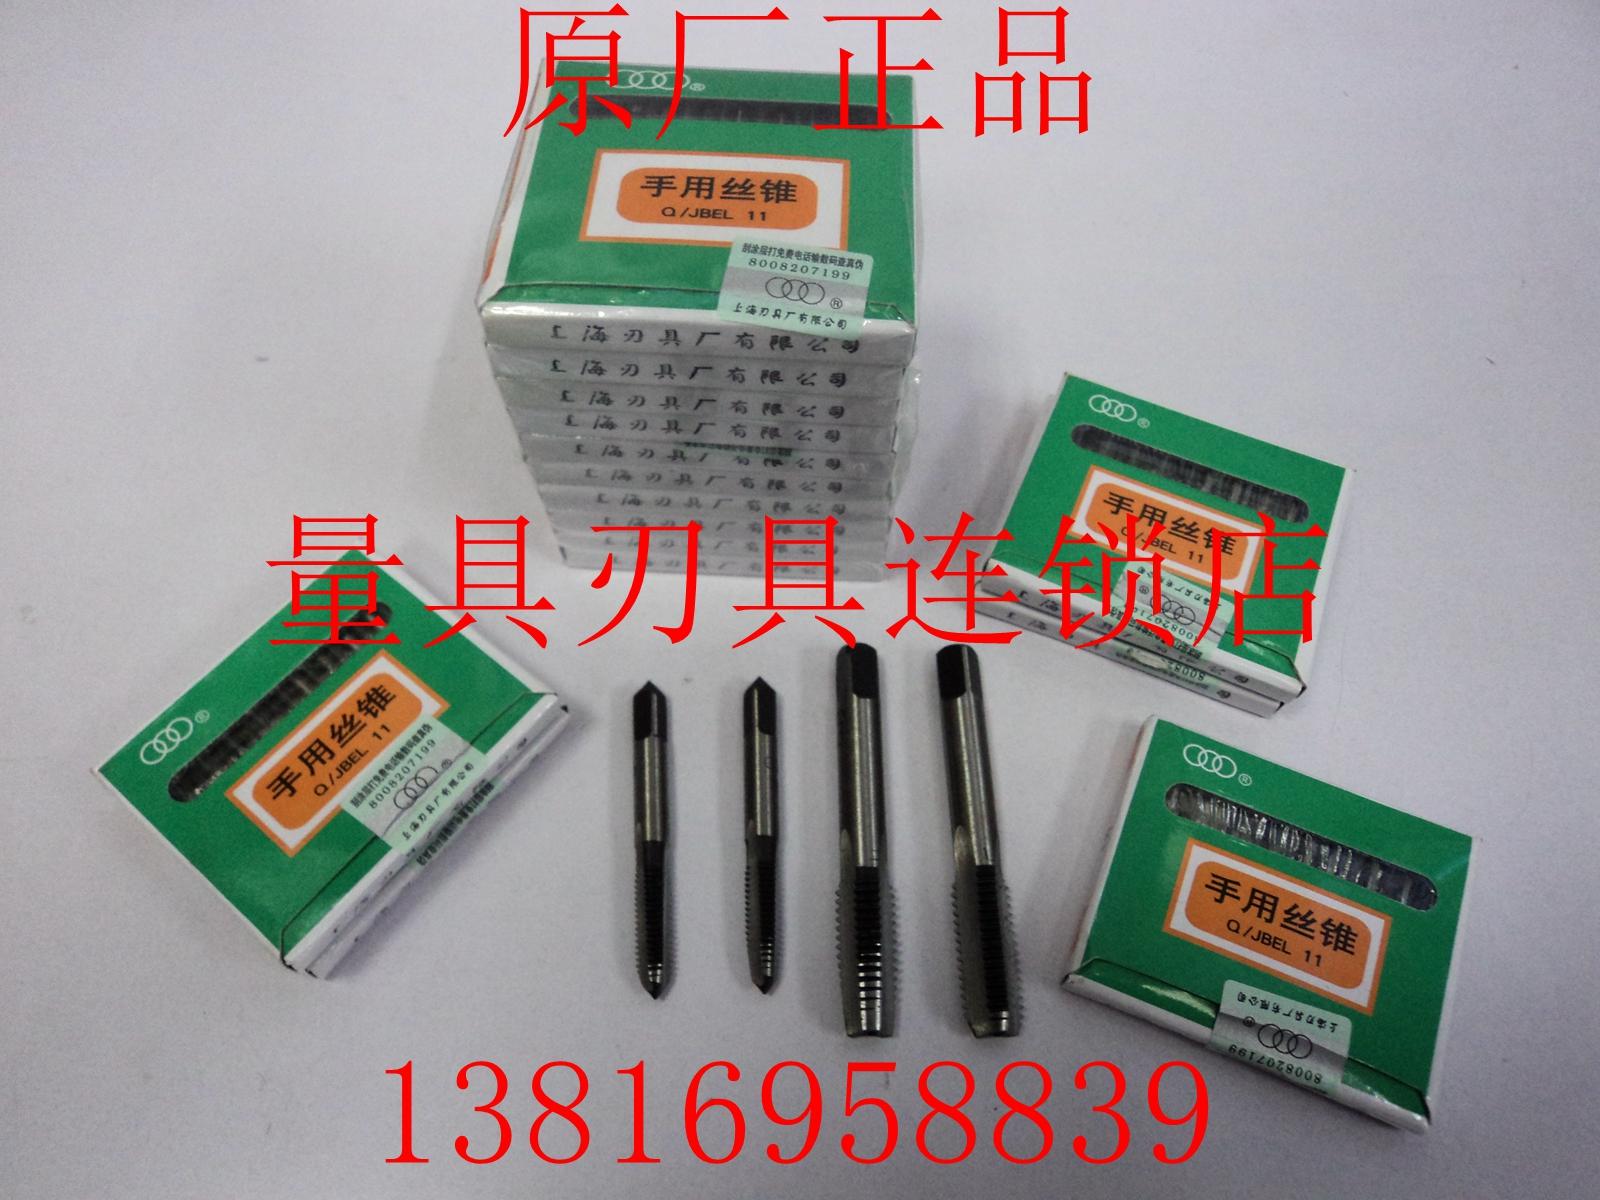 Authentic Shanghai three ring hand taps M4*0.5M5*0.5M6*0.75M7*0.75 false penalty ten